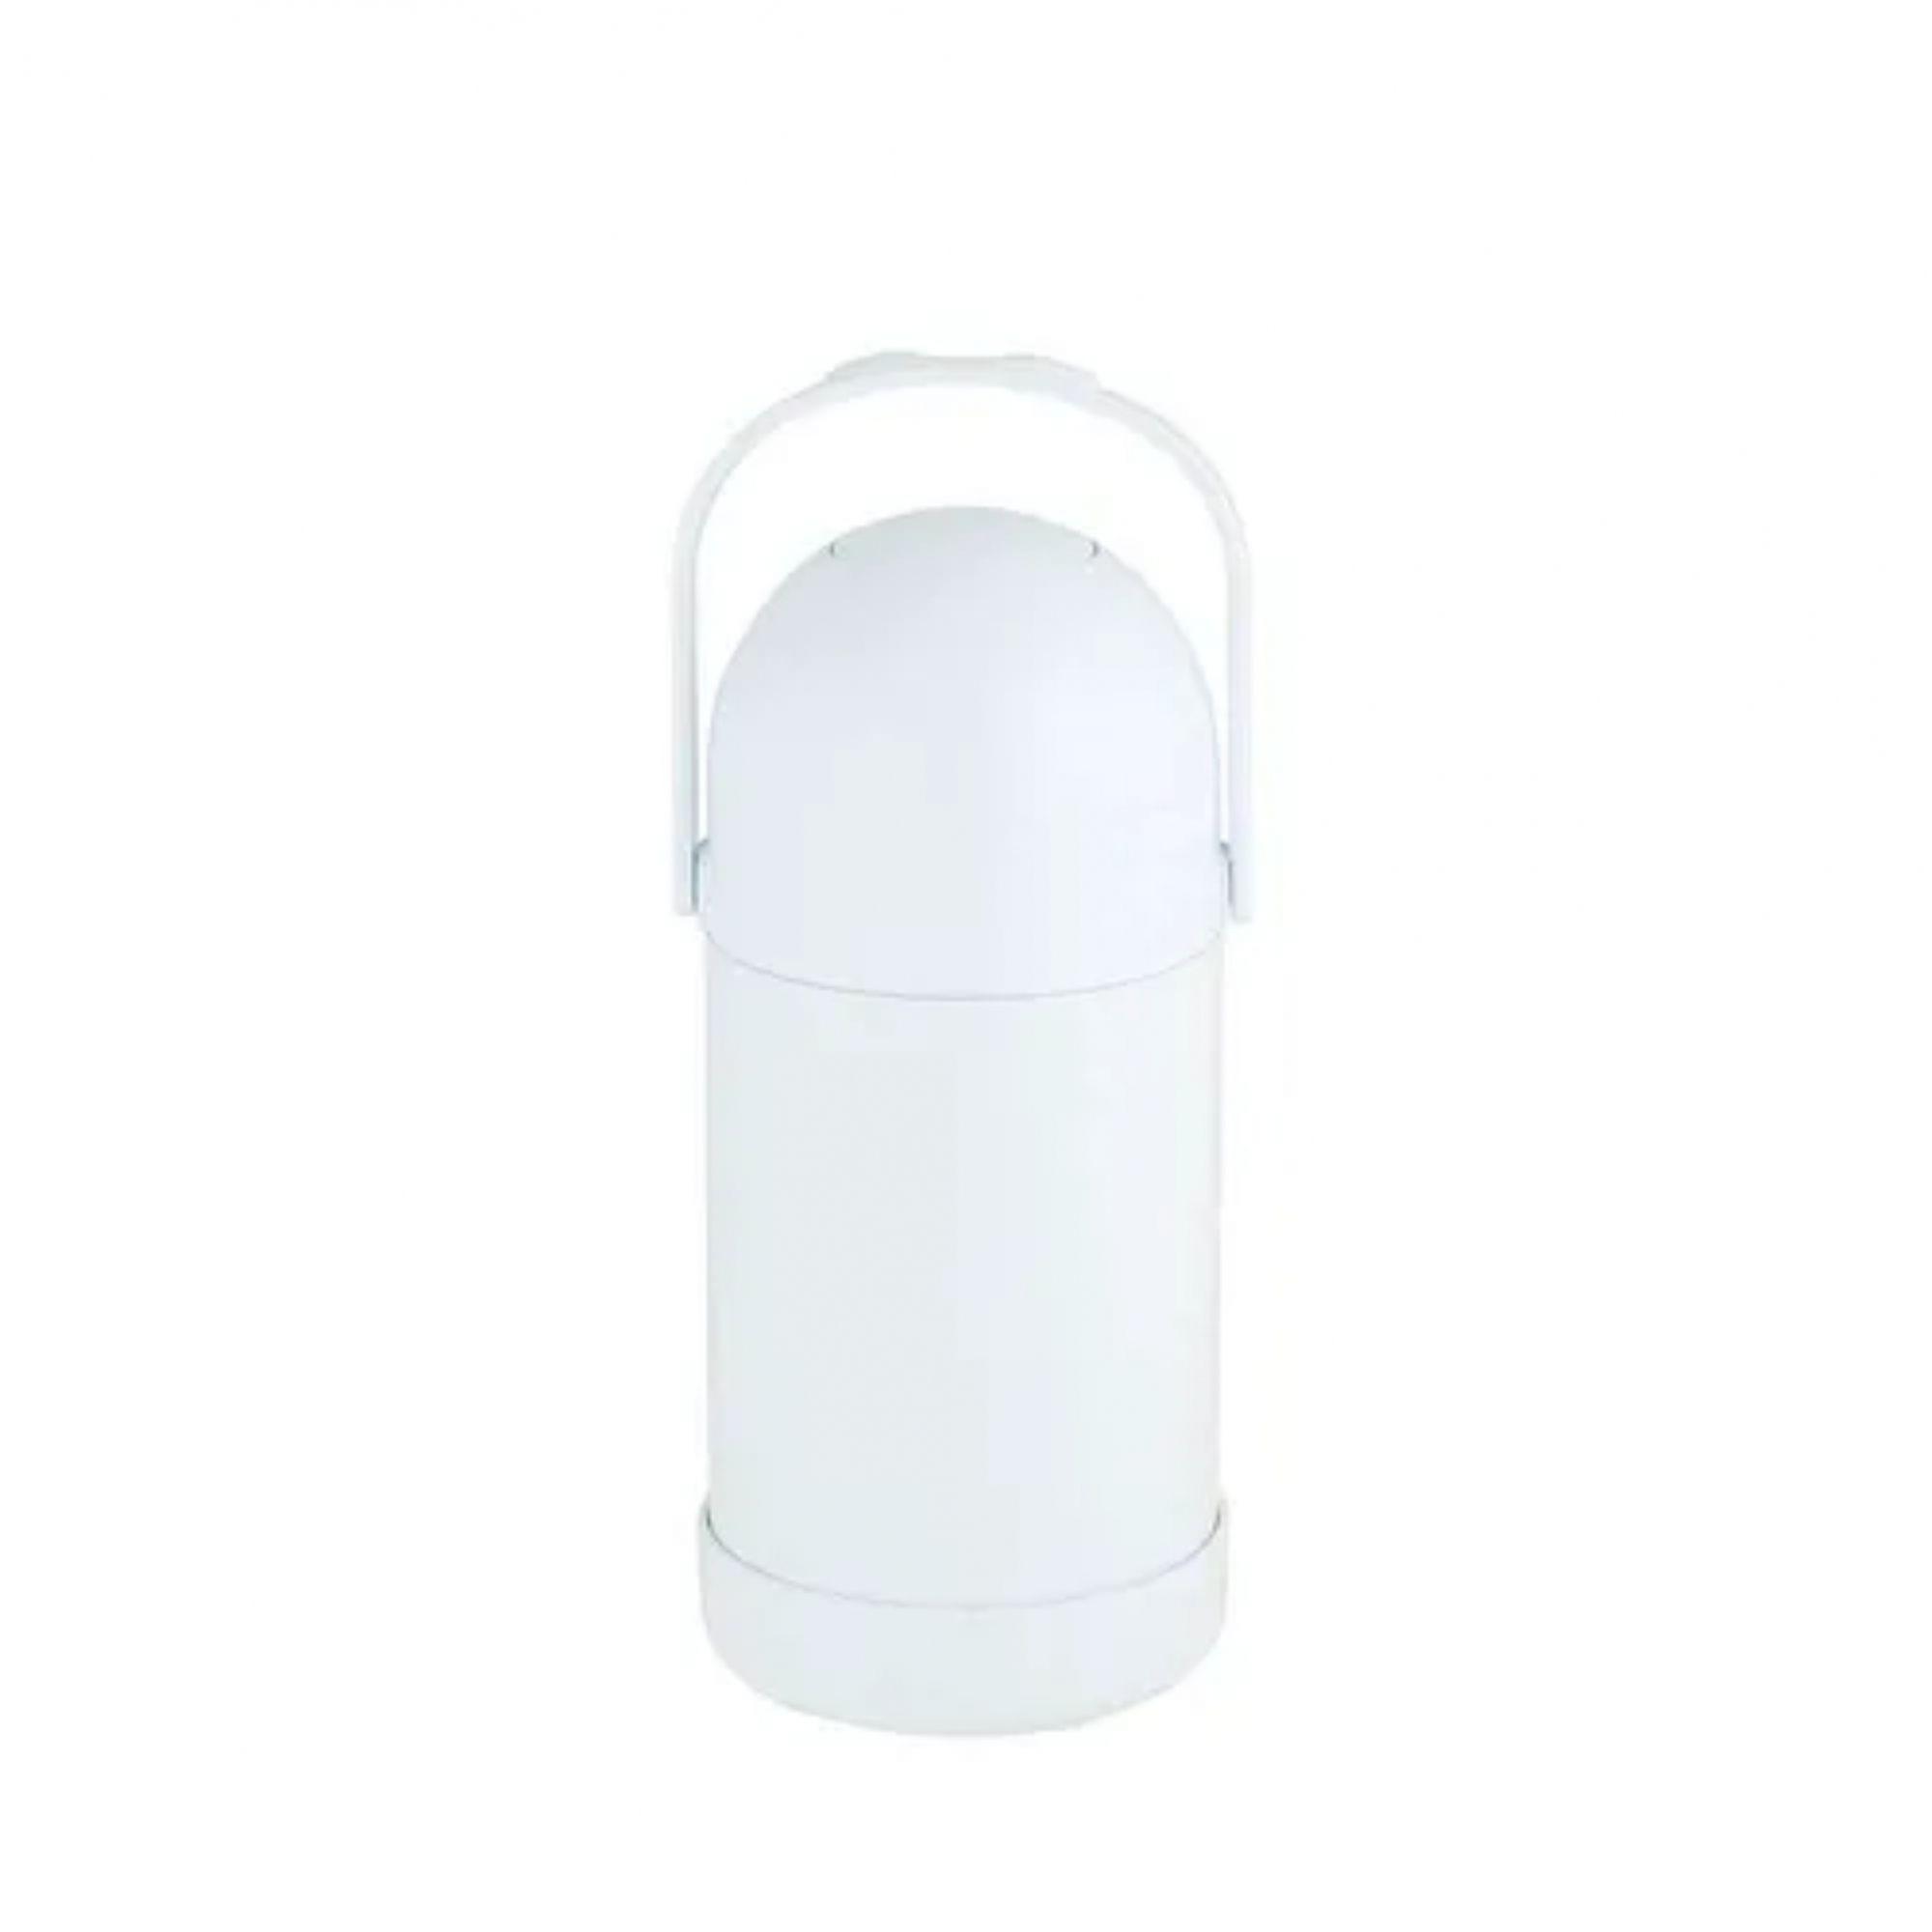 Garrafa de Pressão Nobile 500ml - Cor Branca  - Pensou Filtros